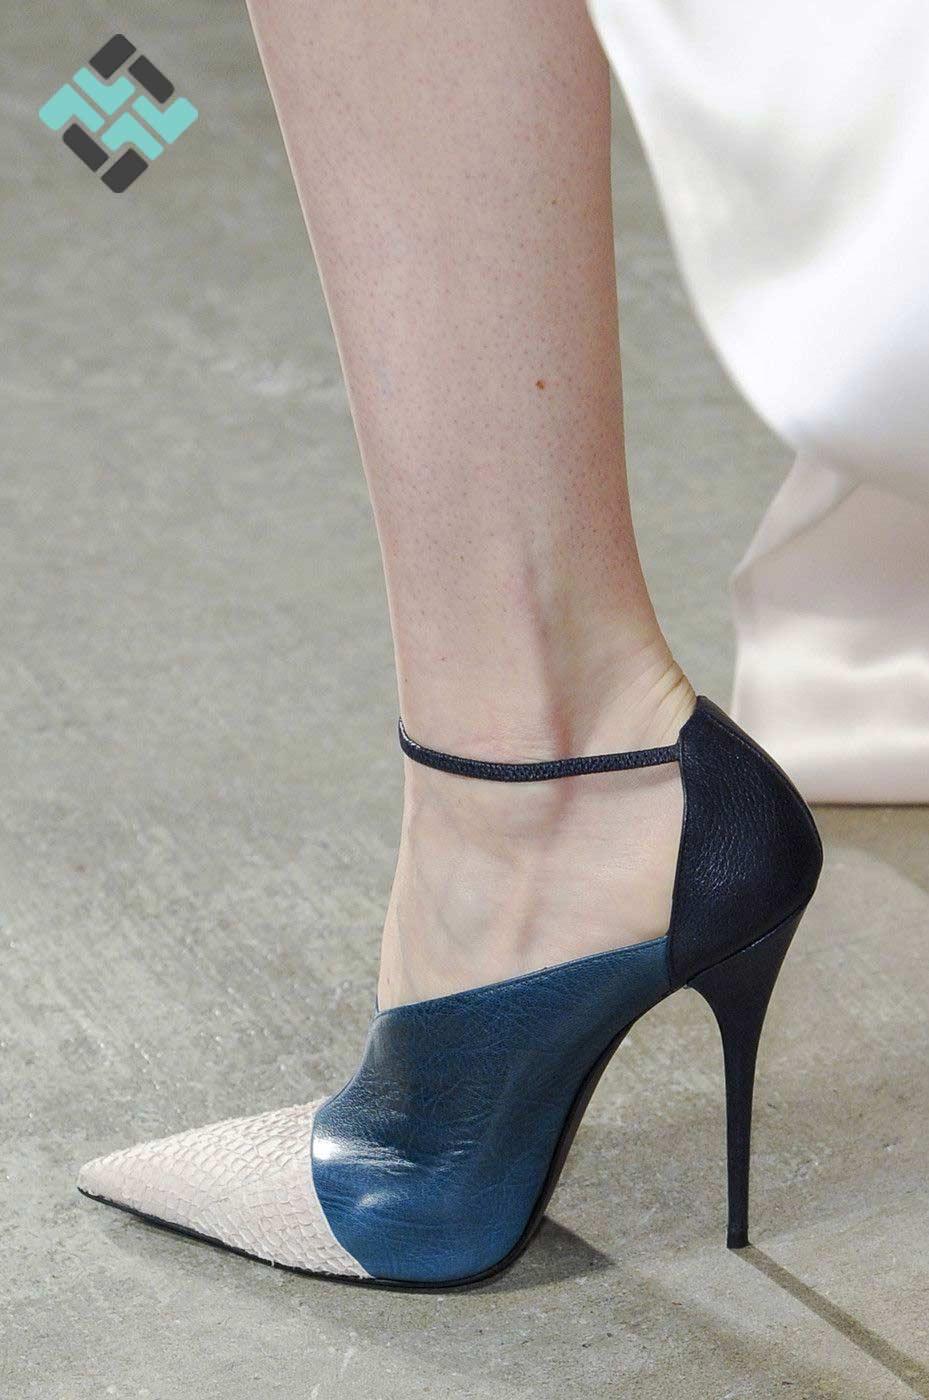 کفش پاشنه سوزنی